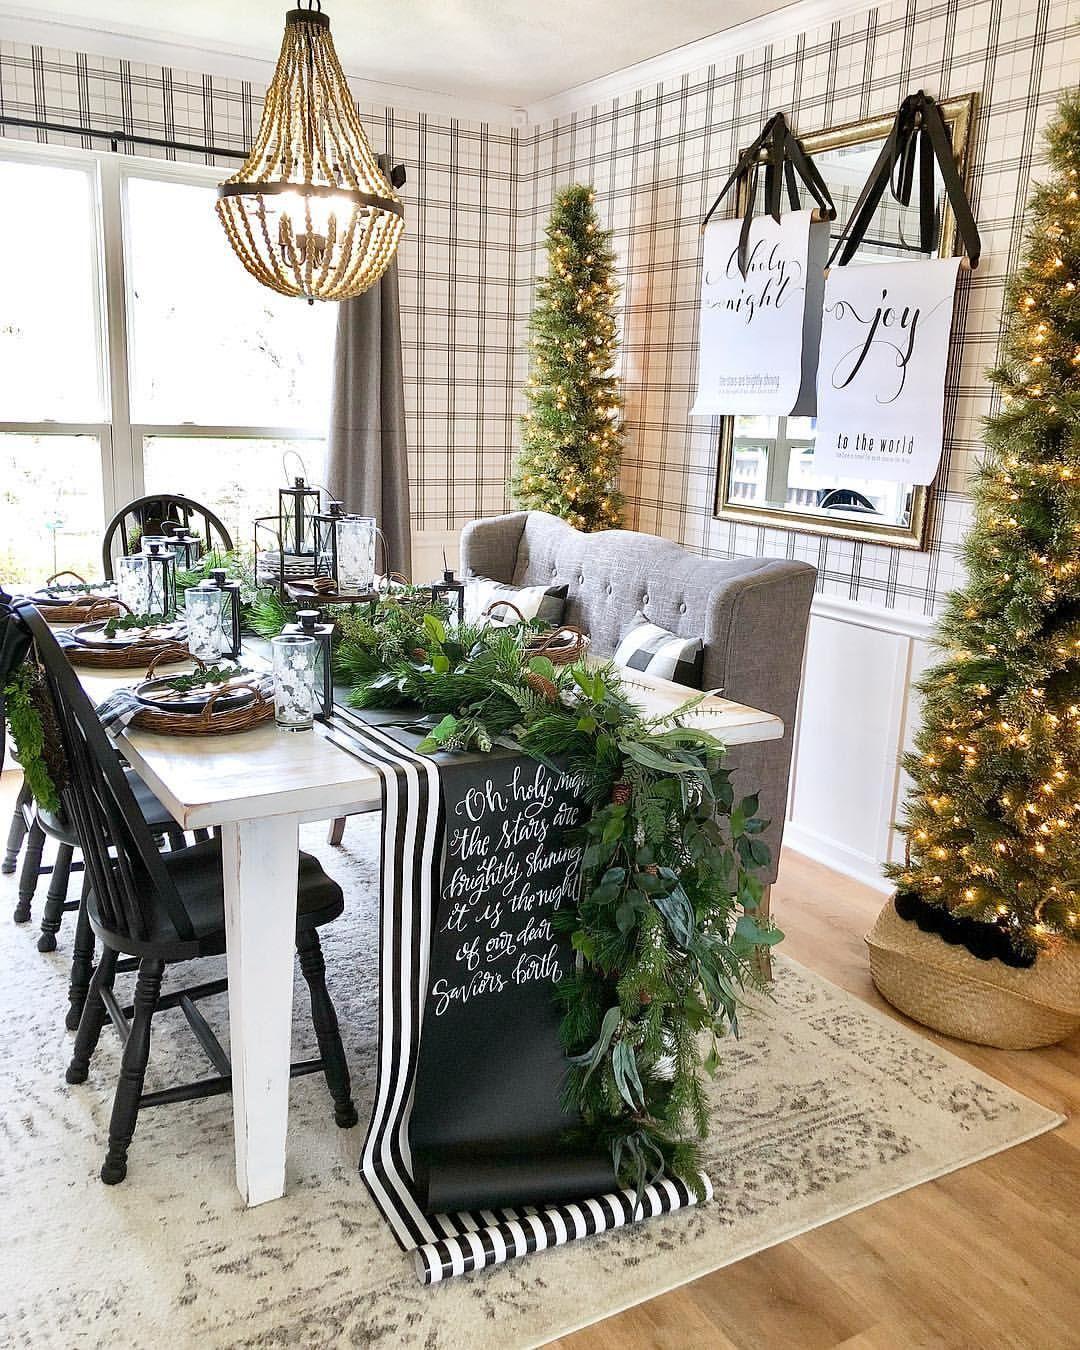 Becky On Instagram Dining Room Sources Post Paper Scrolls Prints Printitengineer Christmas Dining Room Christmas Dining Room Decor Dining Room Table Decor